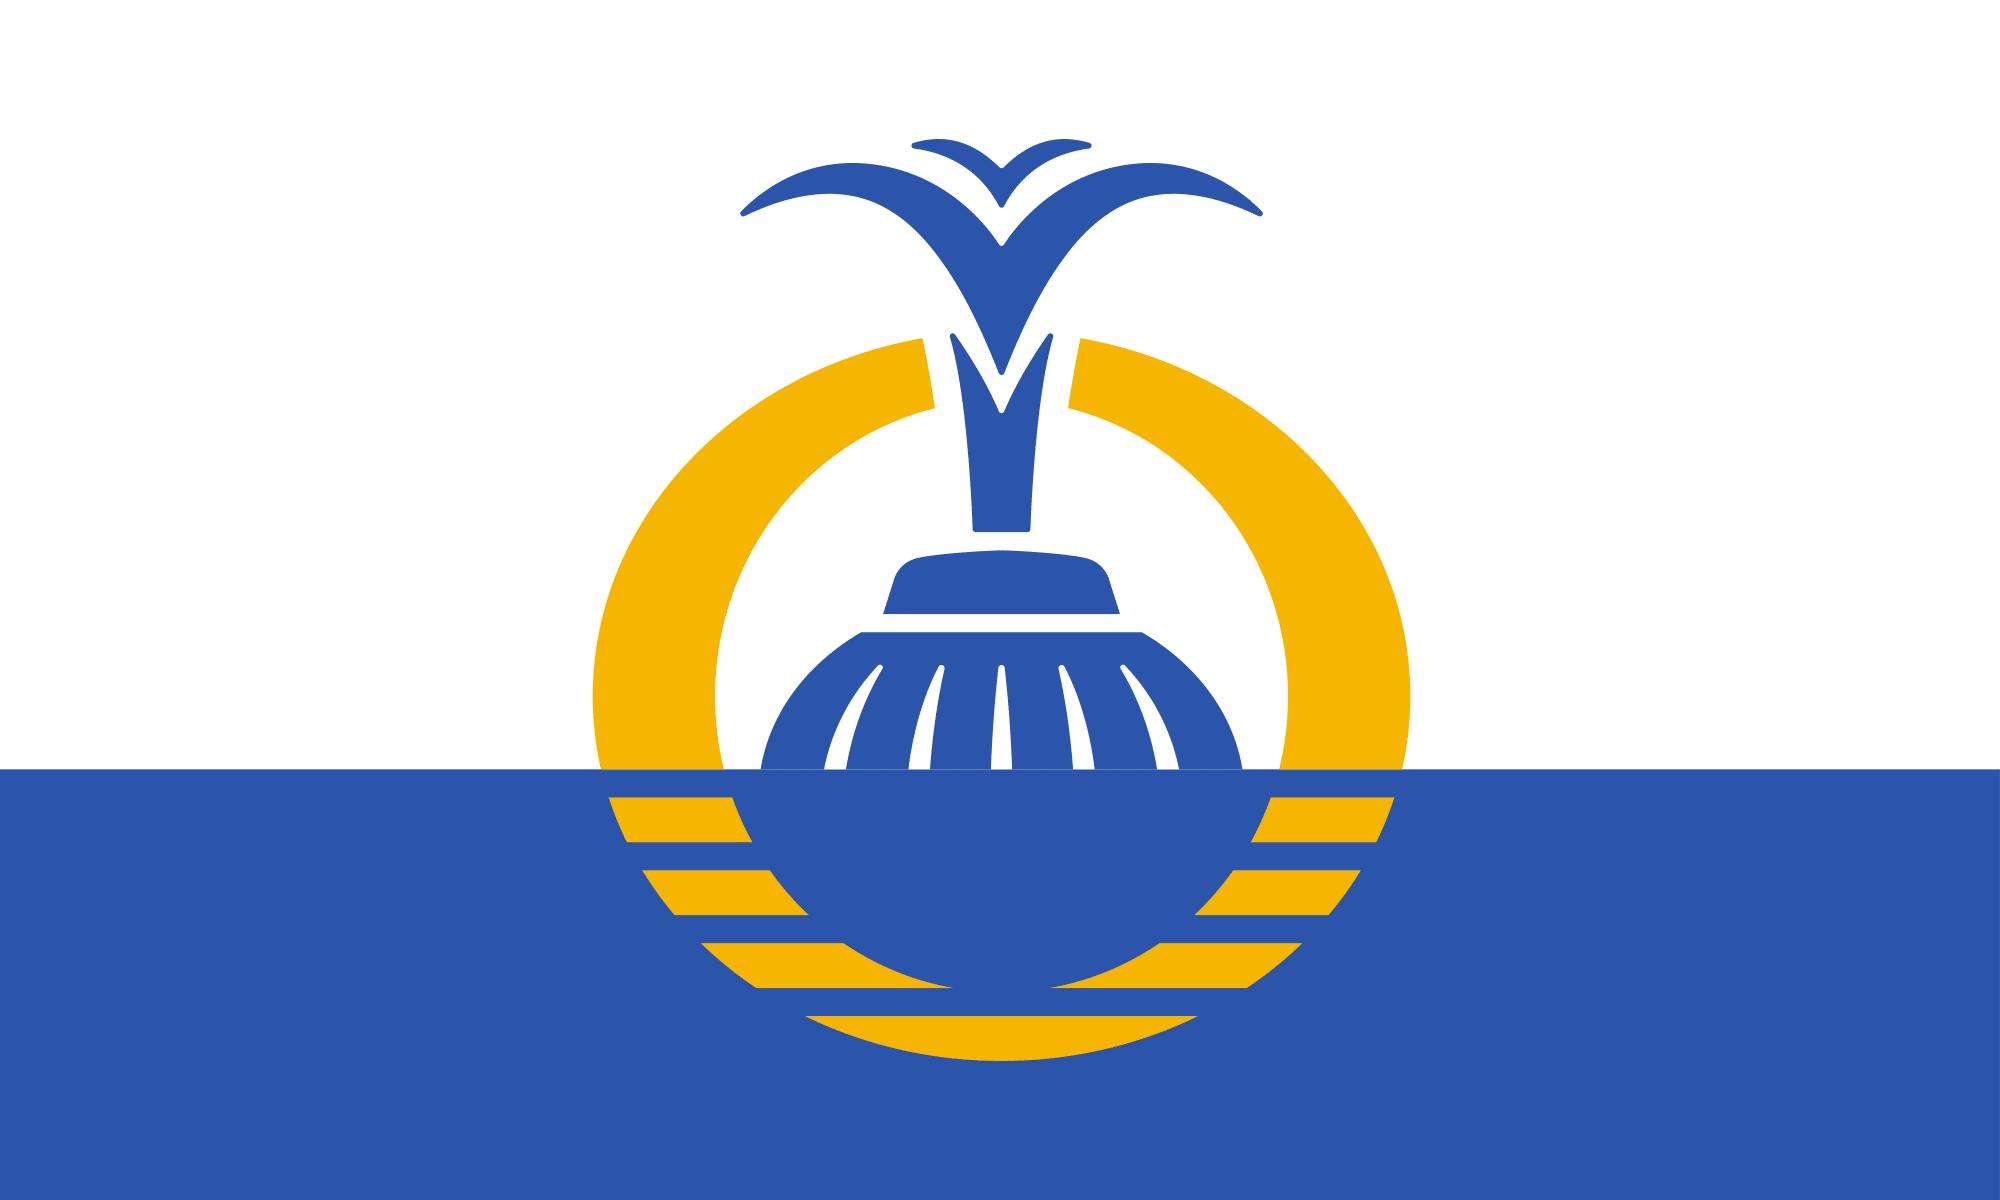 File:Flag of Orlando, Florida.png.